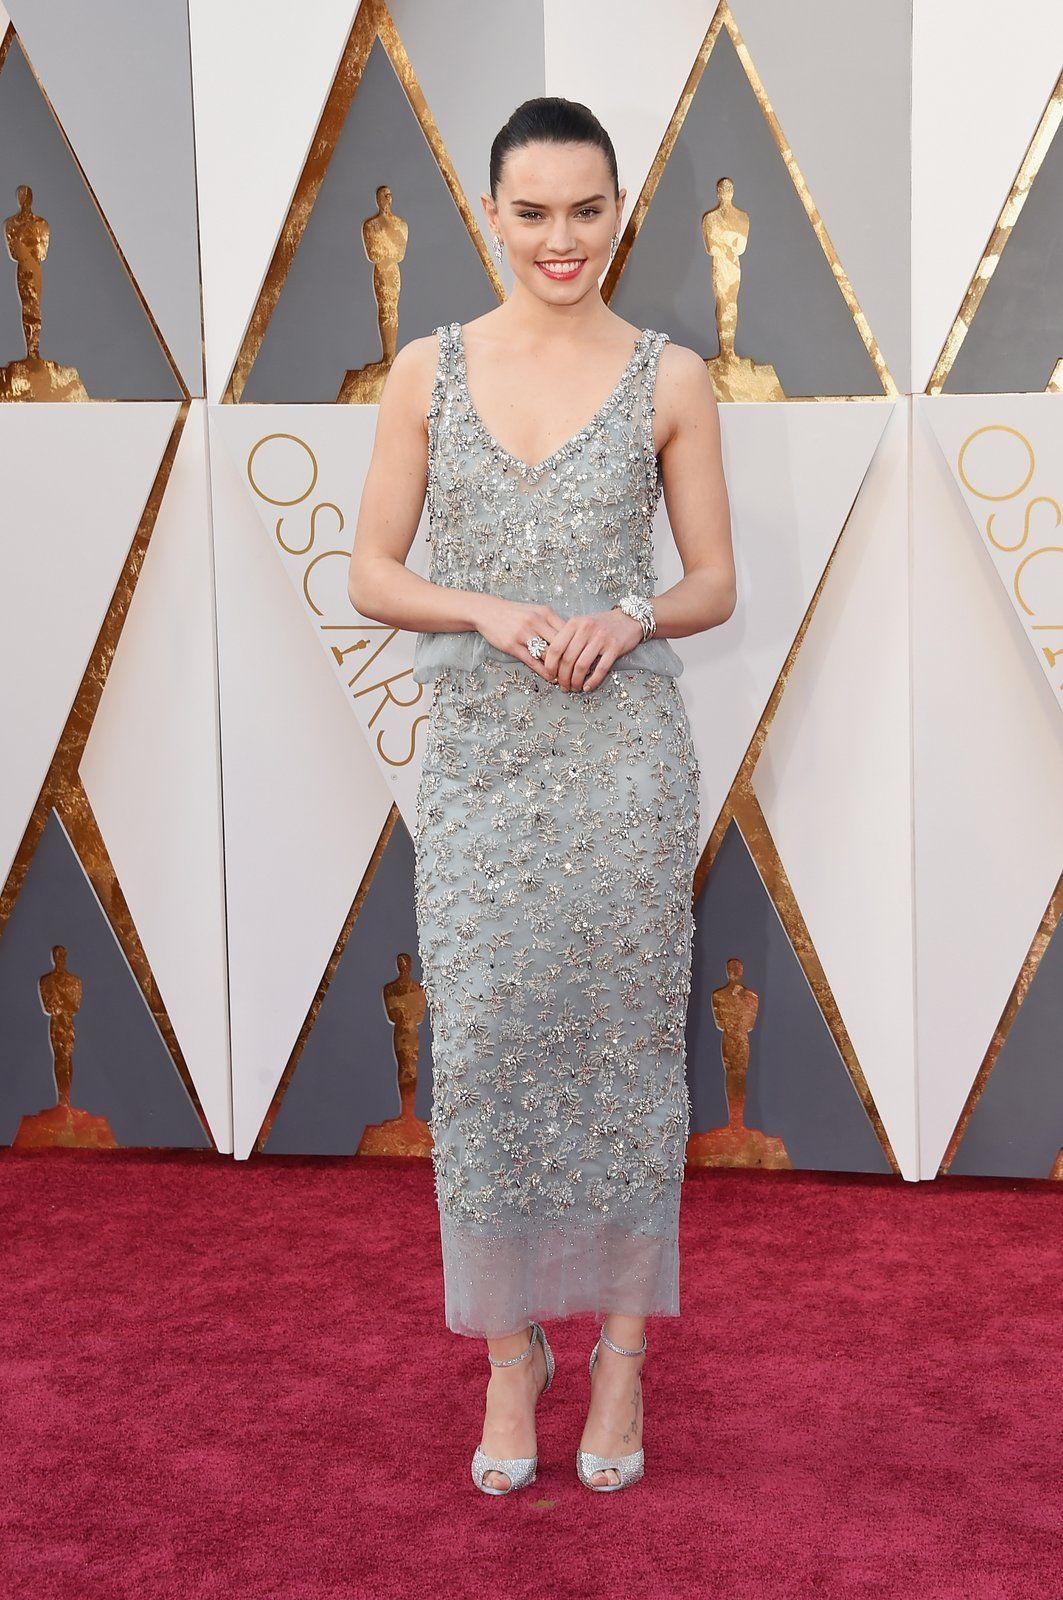 Busy-Brunette: The Oscars 2016